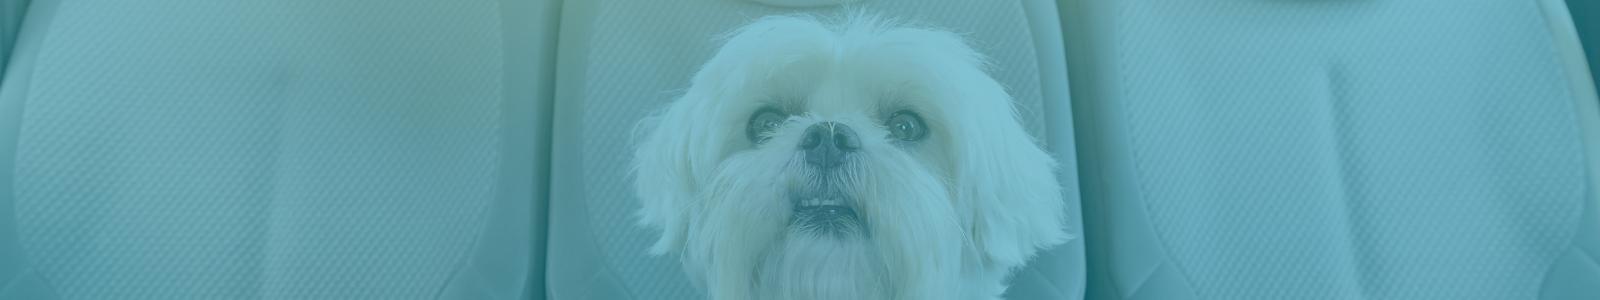 Dog in Car - Create a Pet Emergency Kit